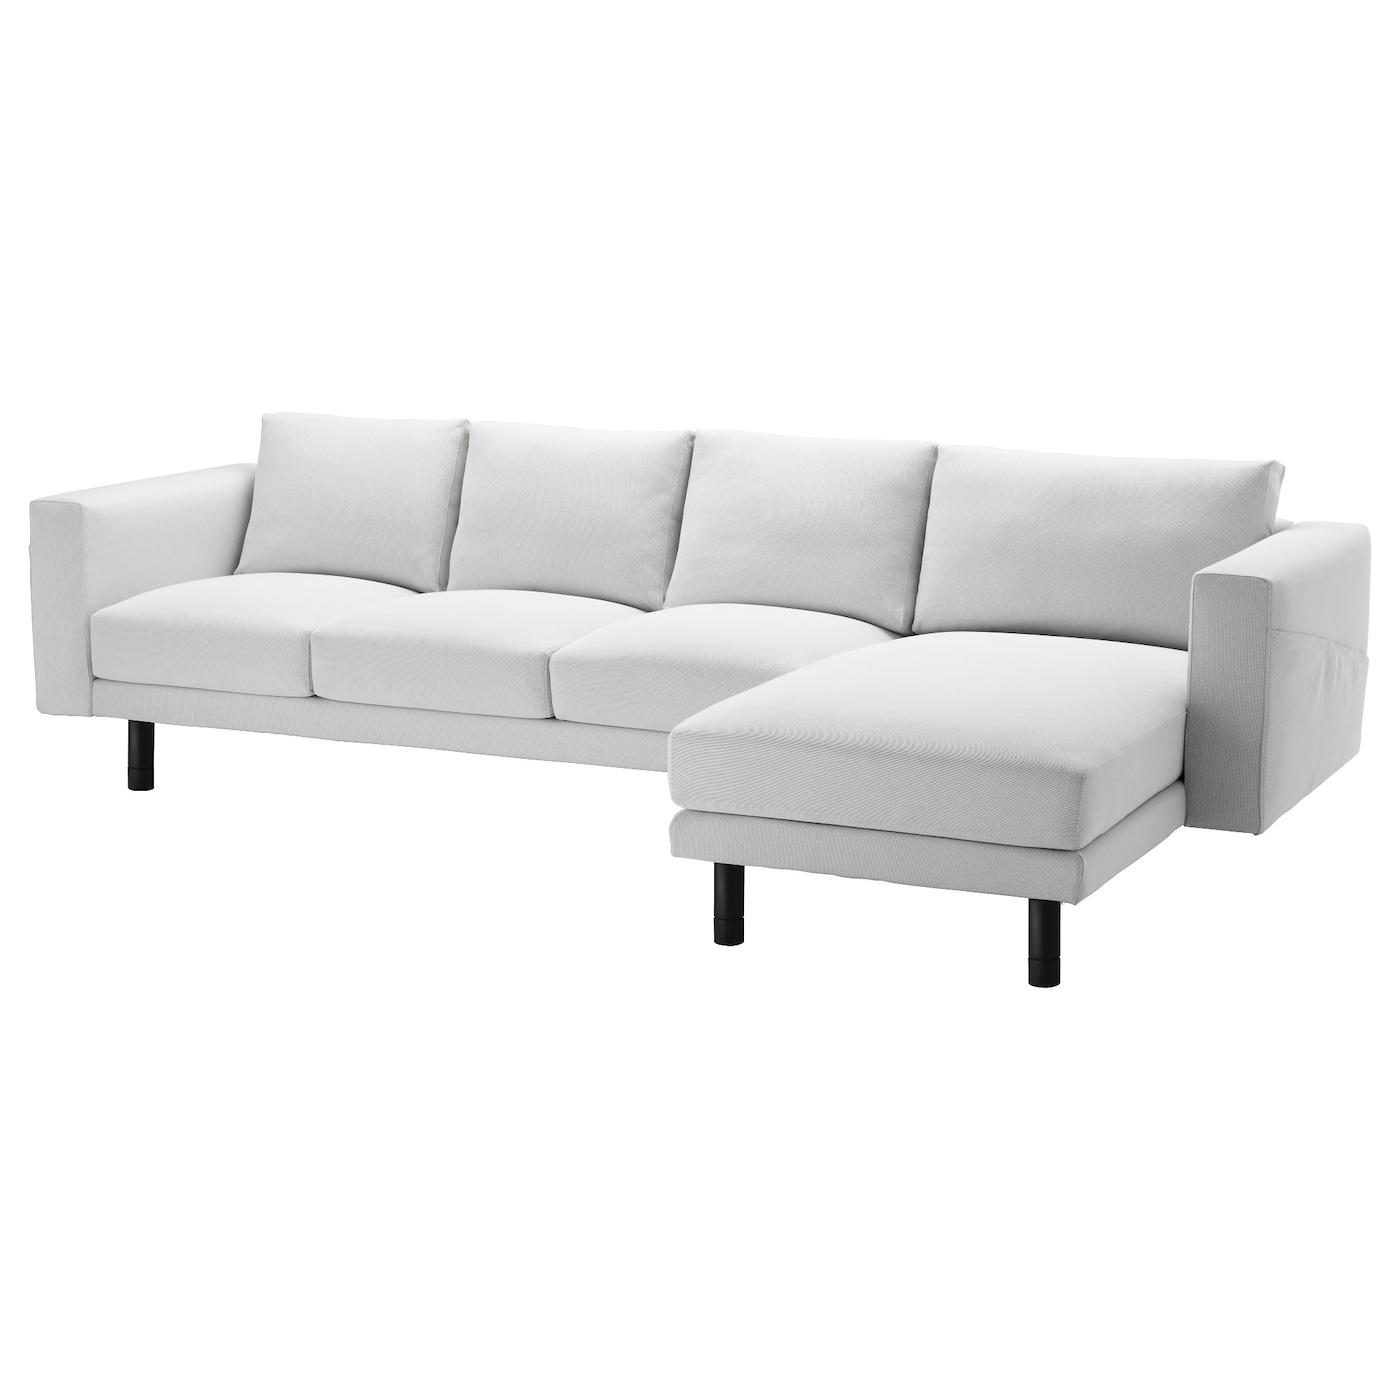 norsborg three seat sofa and chaise longue finnsta white grey ikea. Black Bedroom Furniture Sets. Home Design Ideas